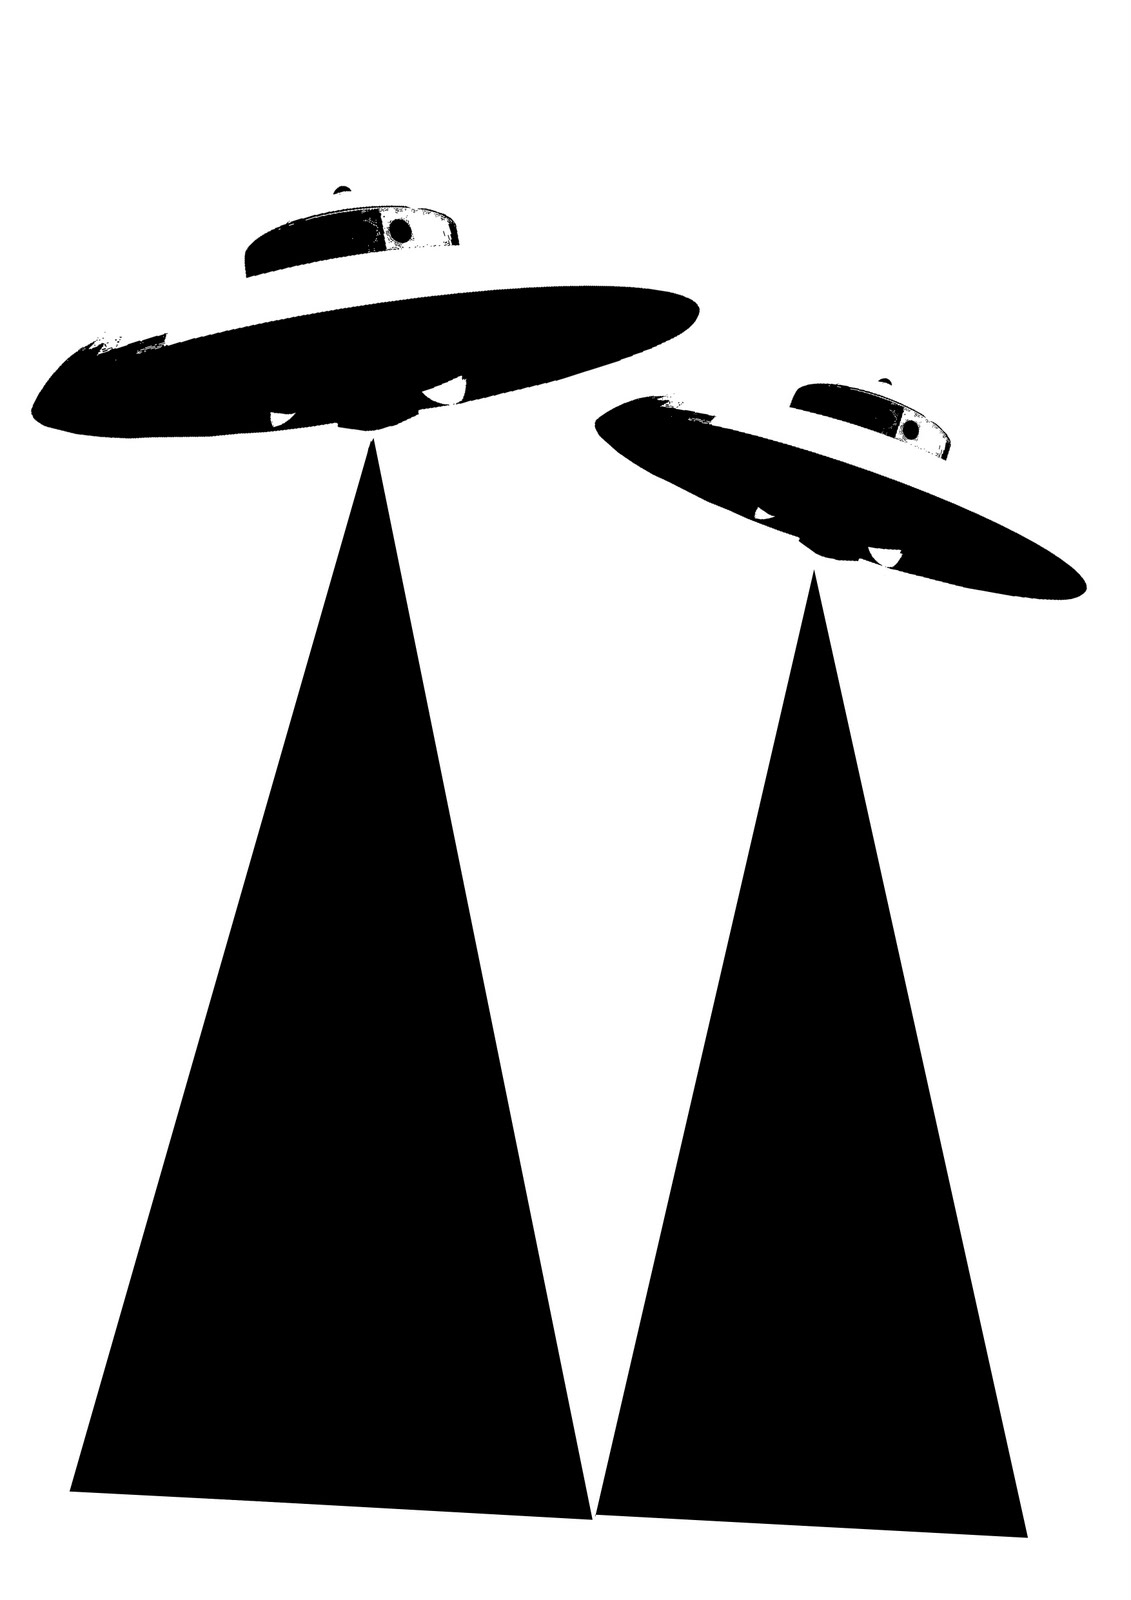 Ufo stencil galleryhip com the hippest galleries